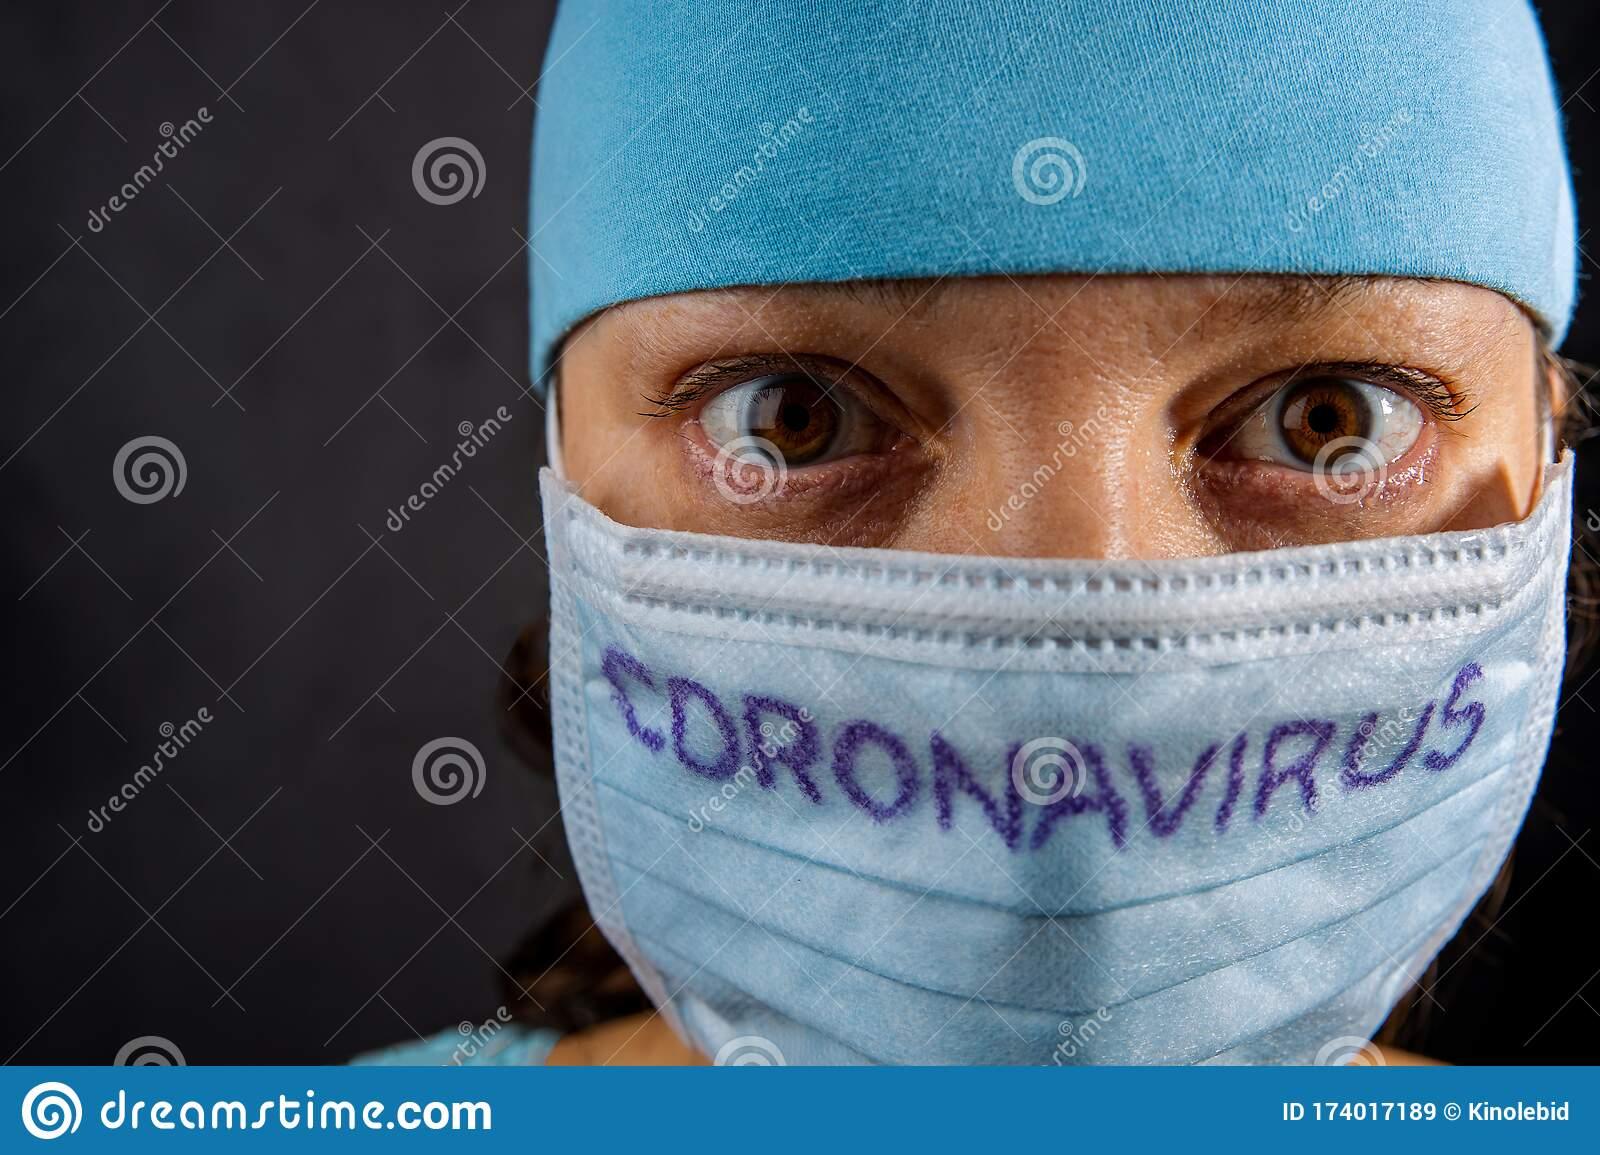 nurse mask.jpg